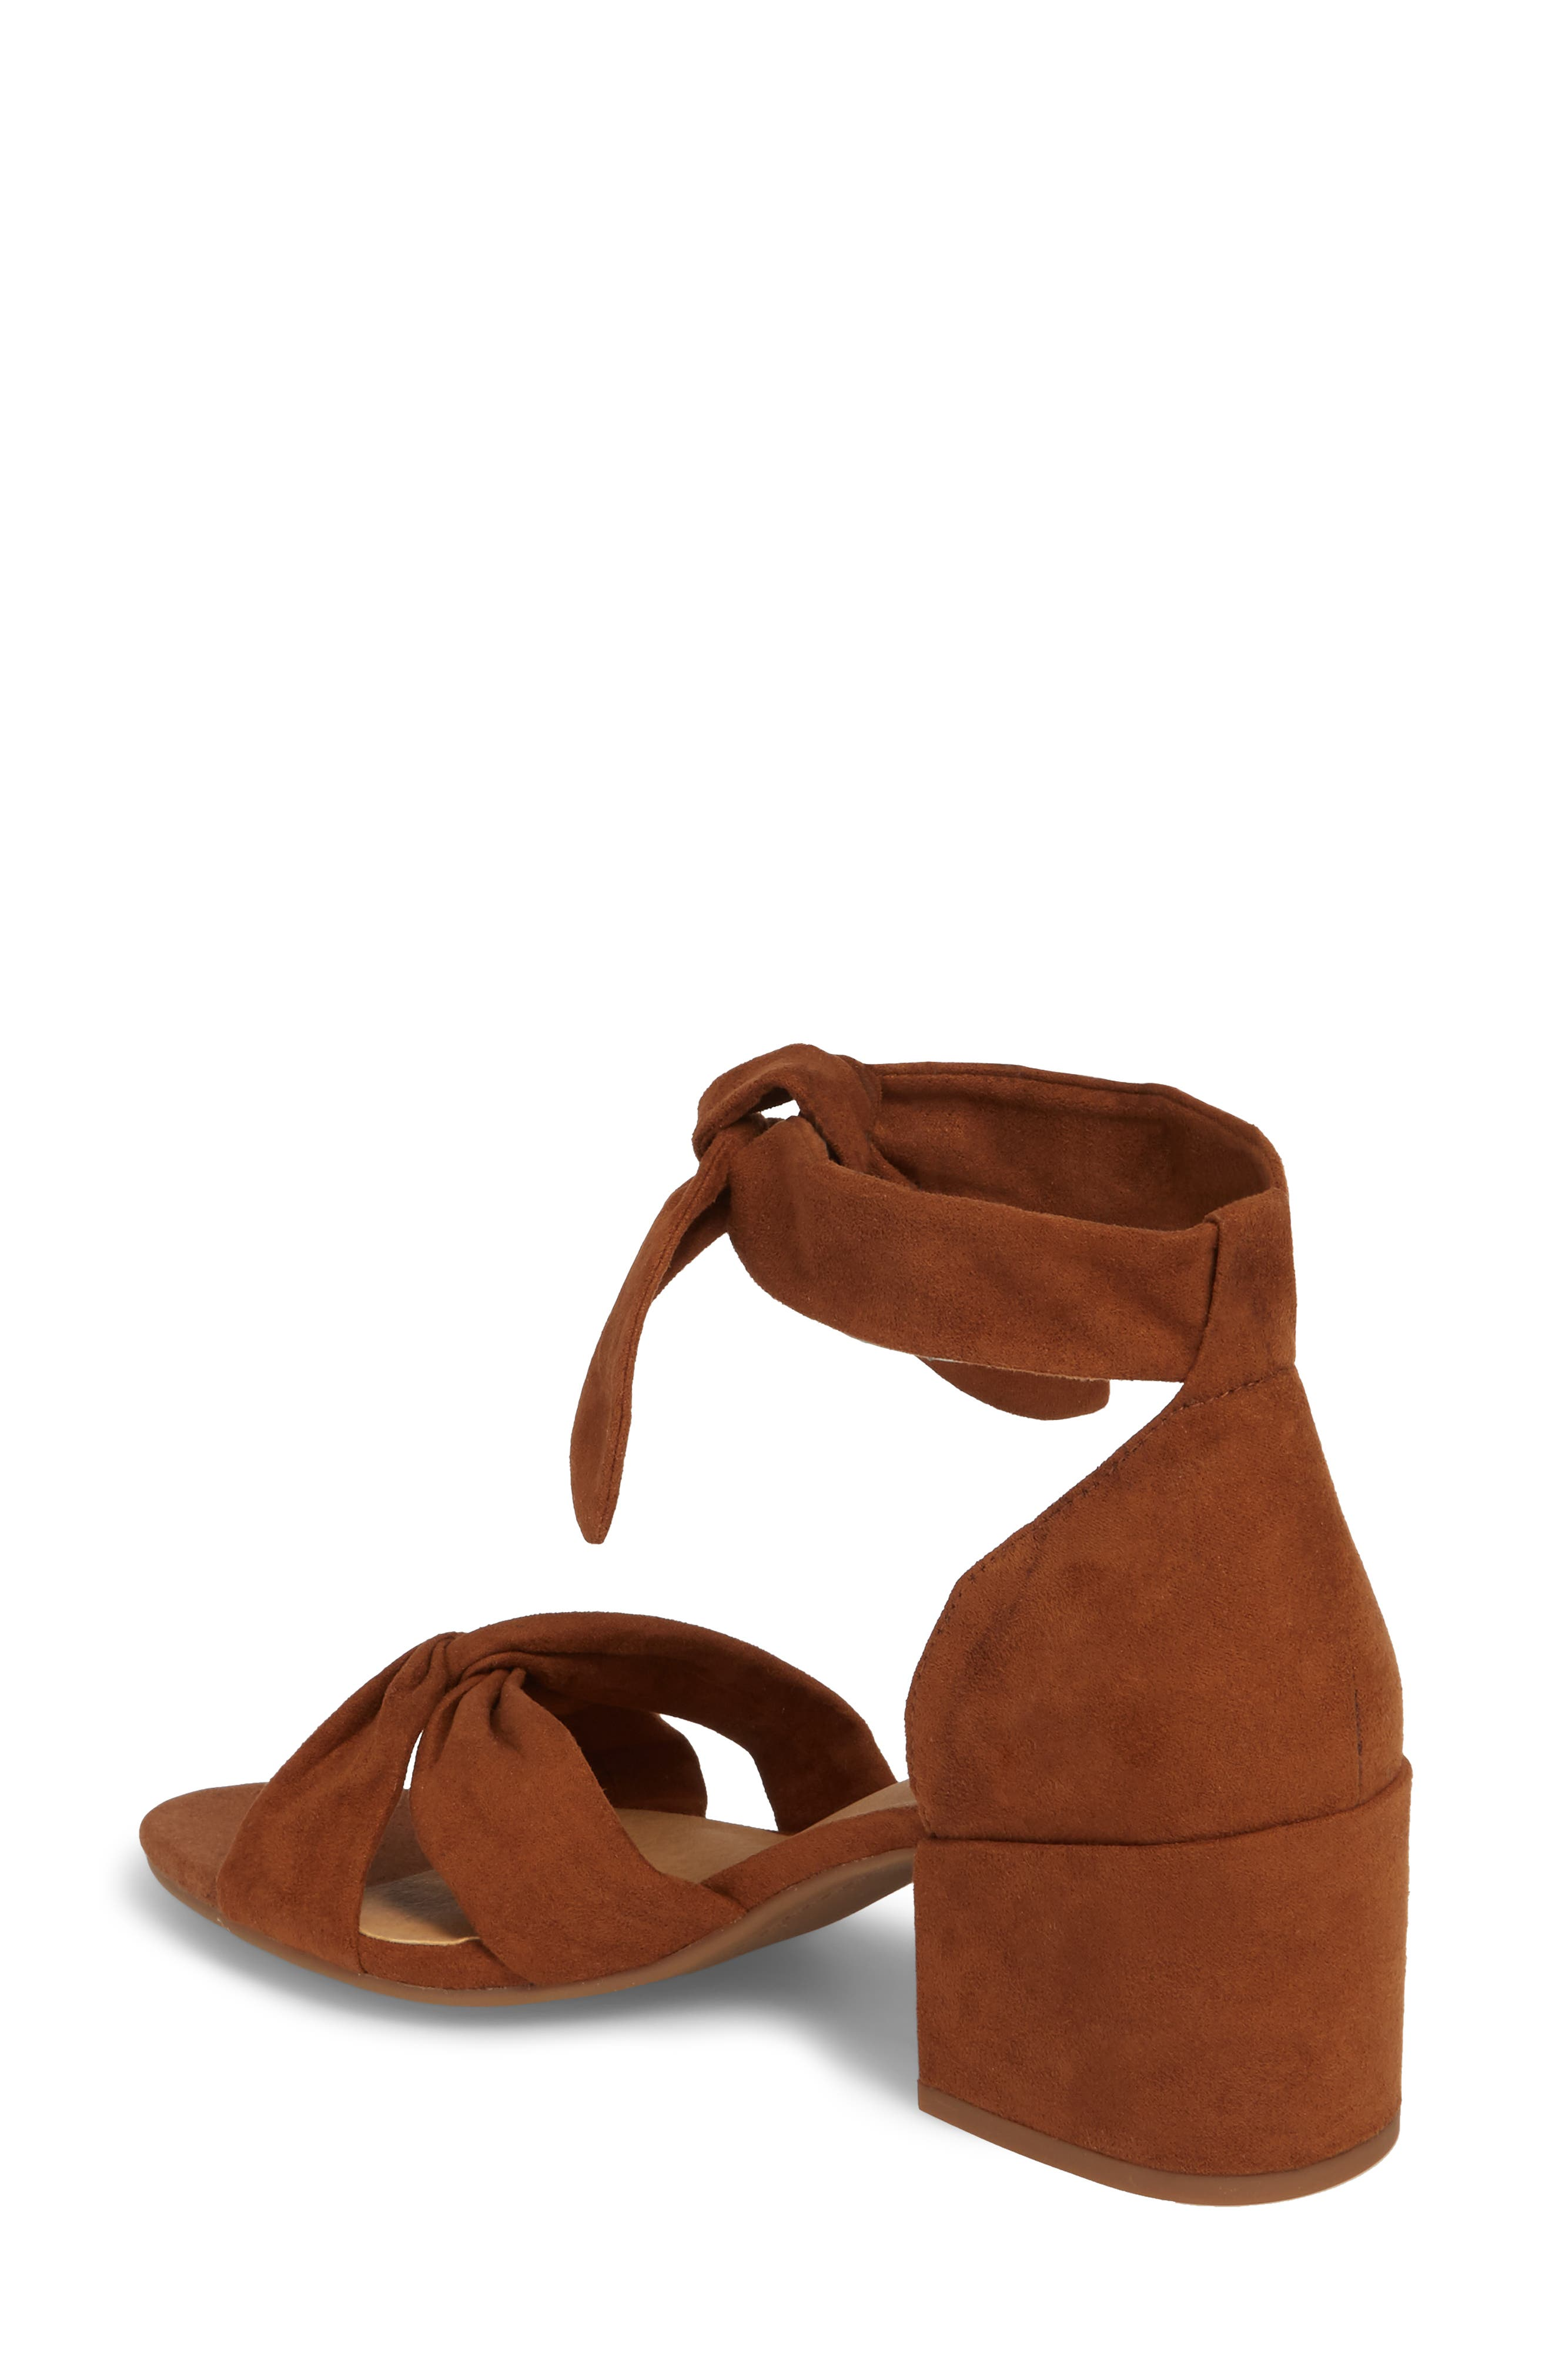 Xaylah Ankle Strap Sandal,                             Alternate thumbnail 2, color,                             Cedar Leather